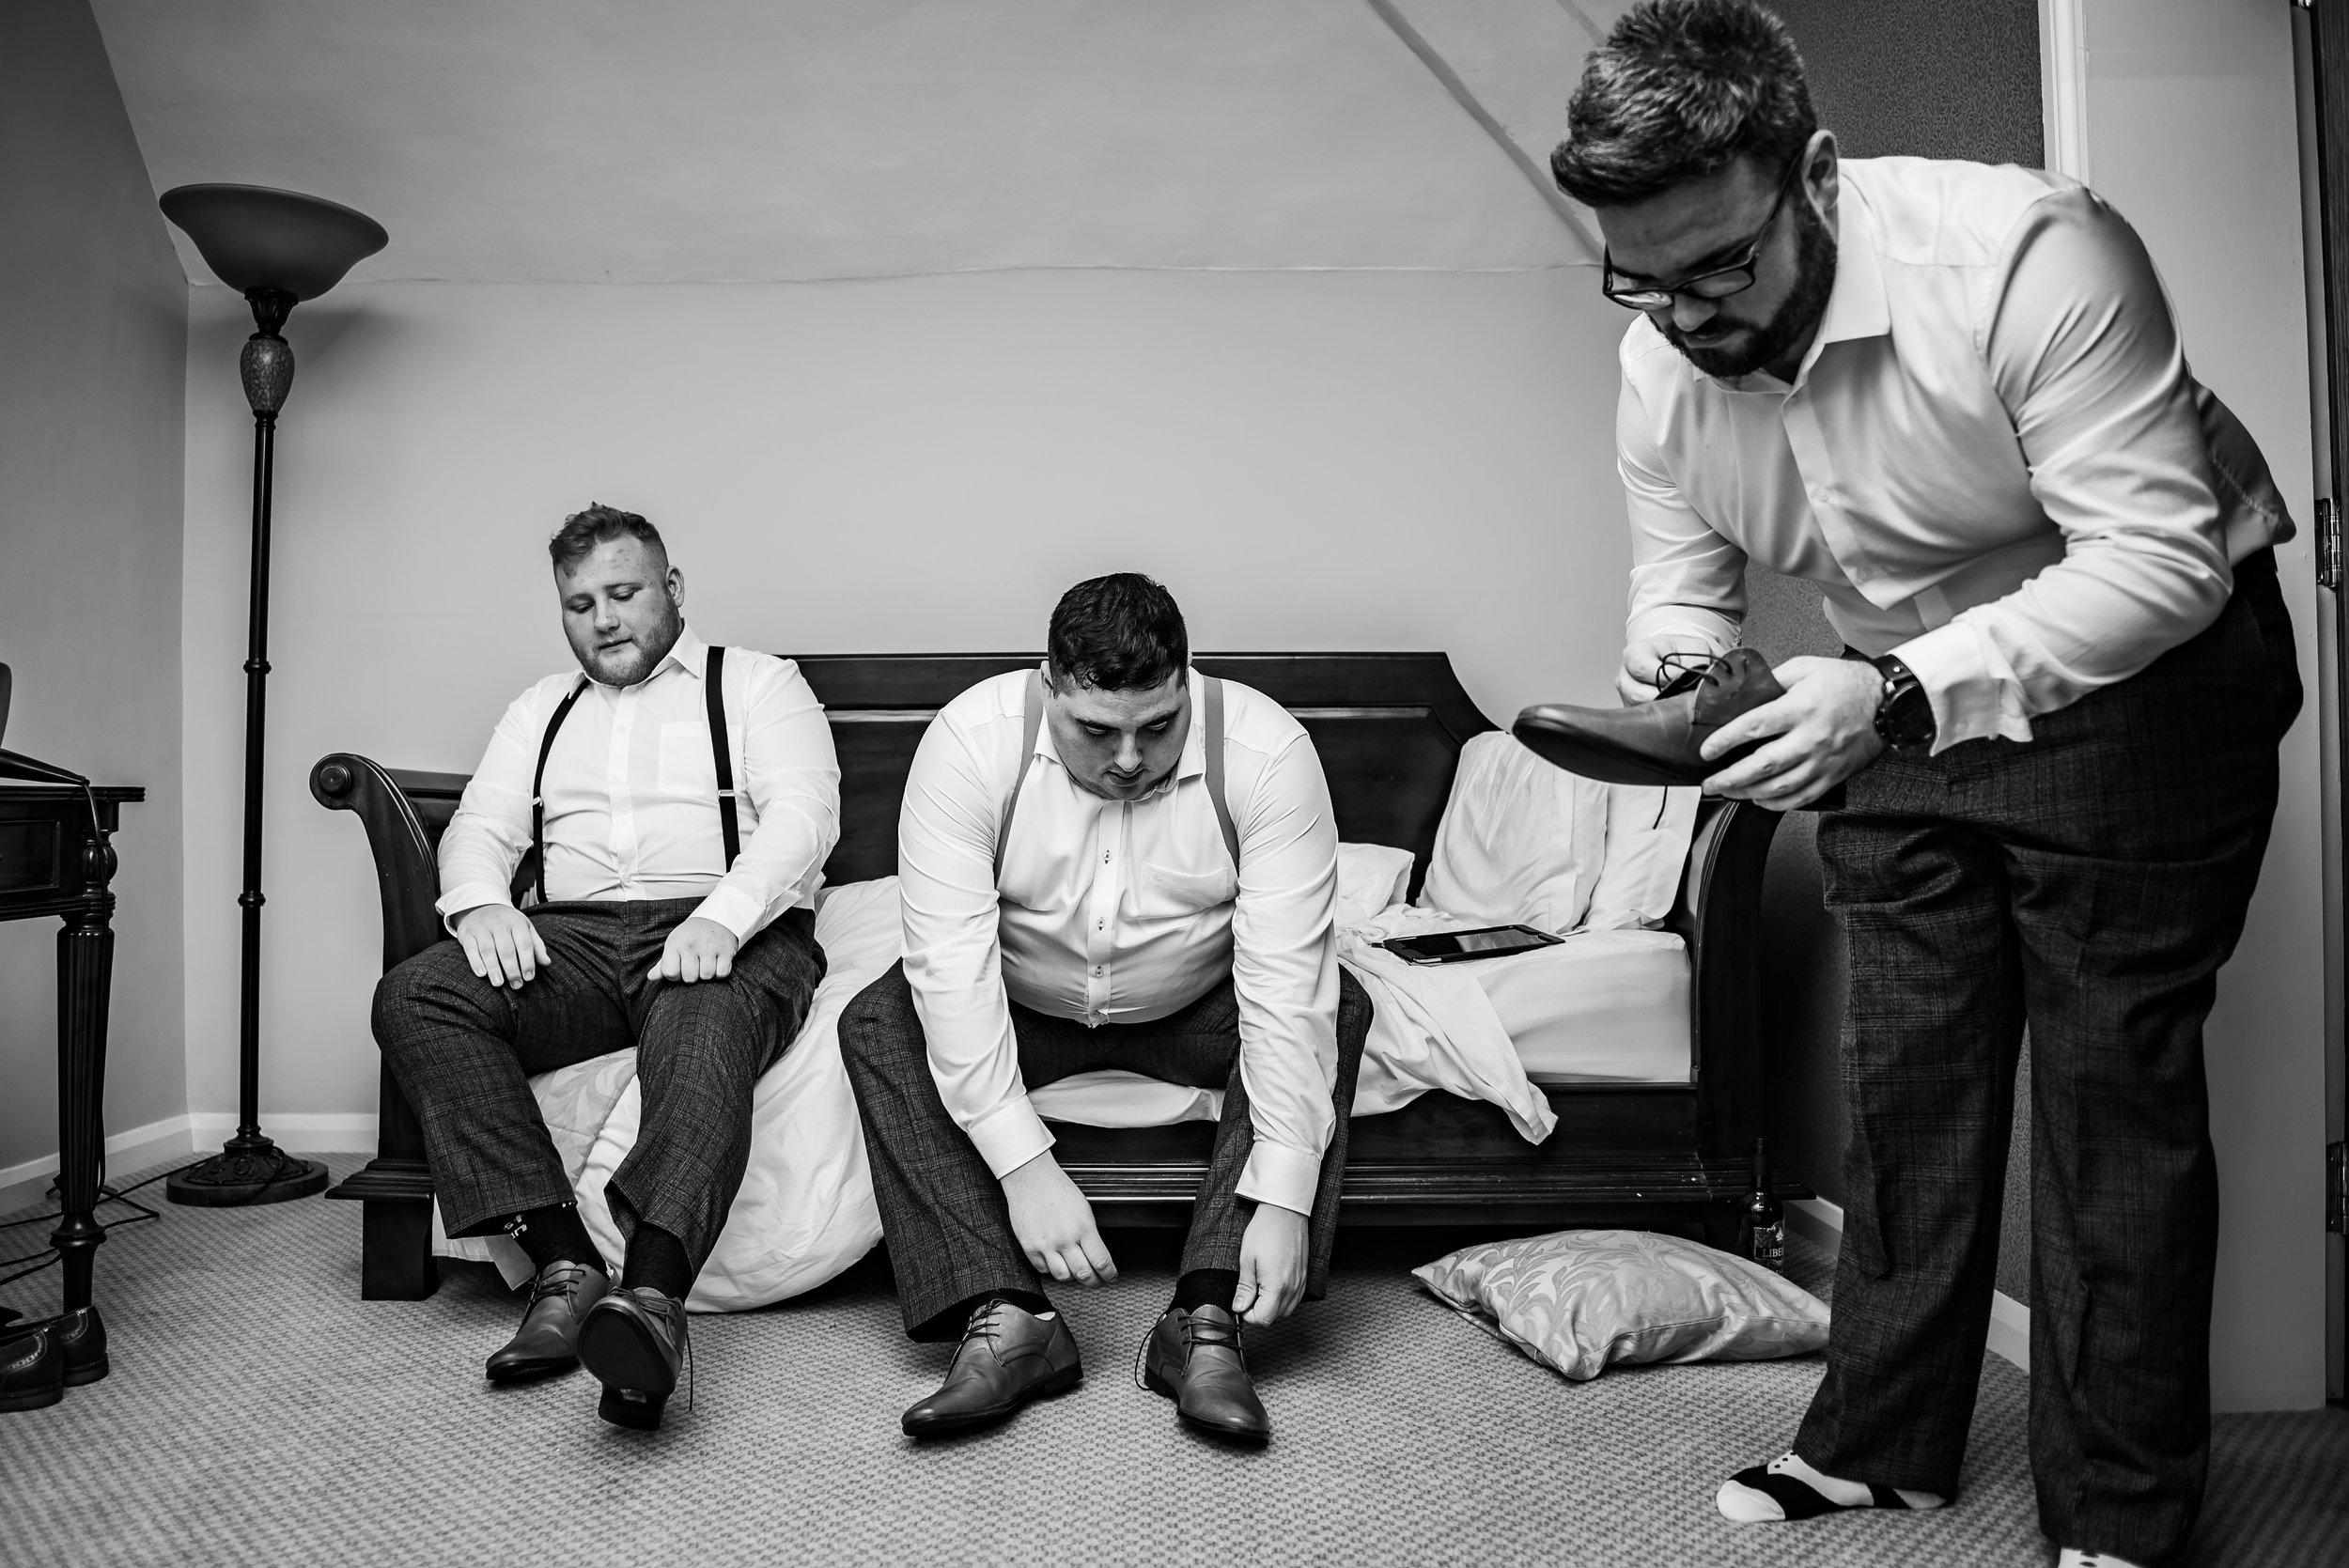 castle Bromwich hall hotel wedding photography groomsmen getting ready